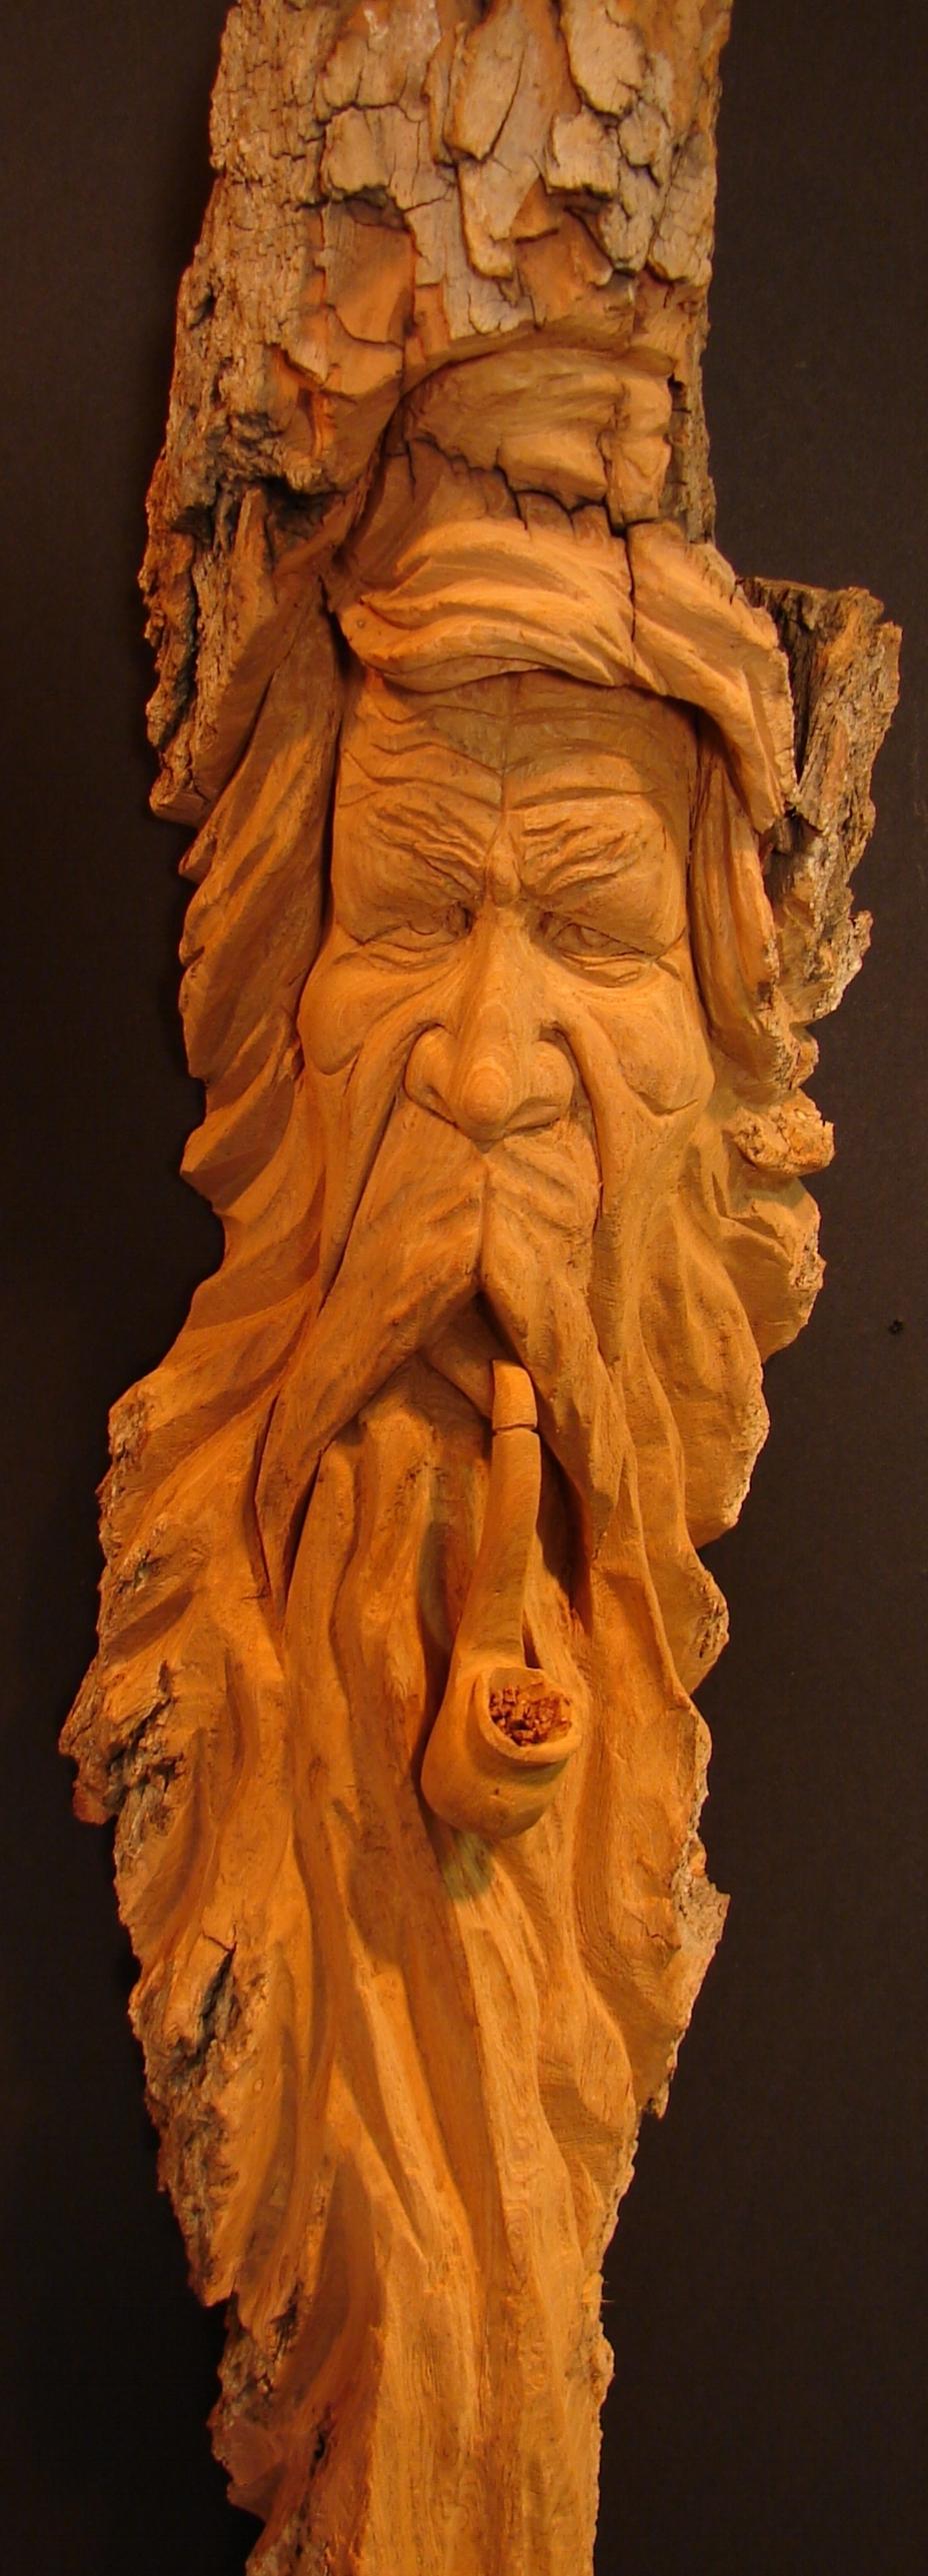 Carving Pix. 017.jpg